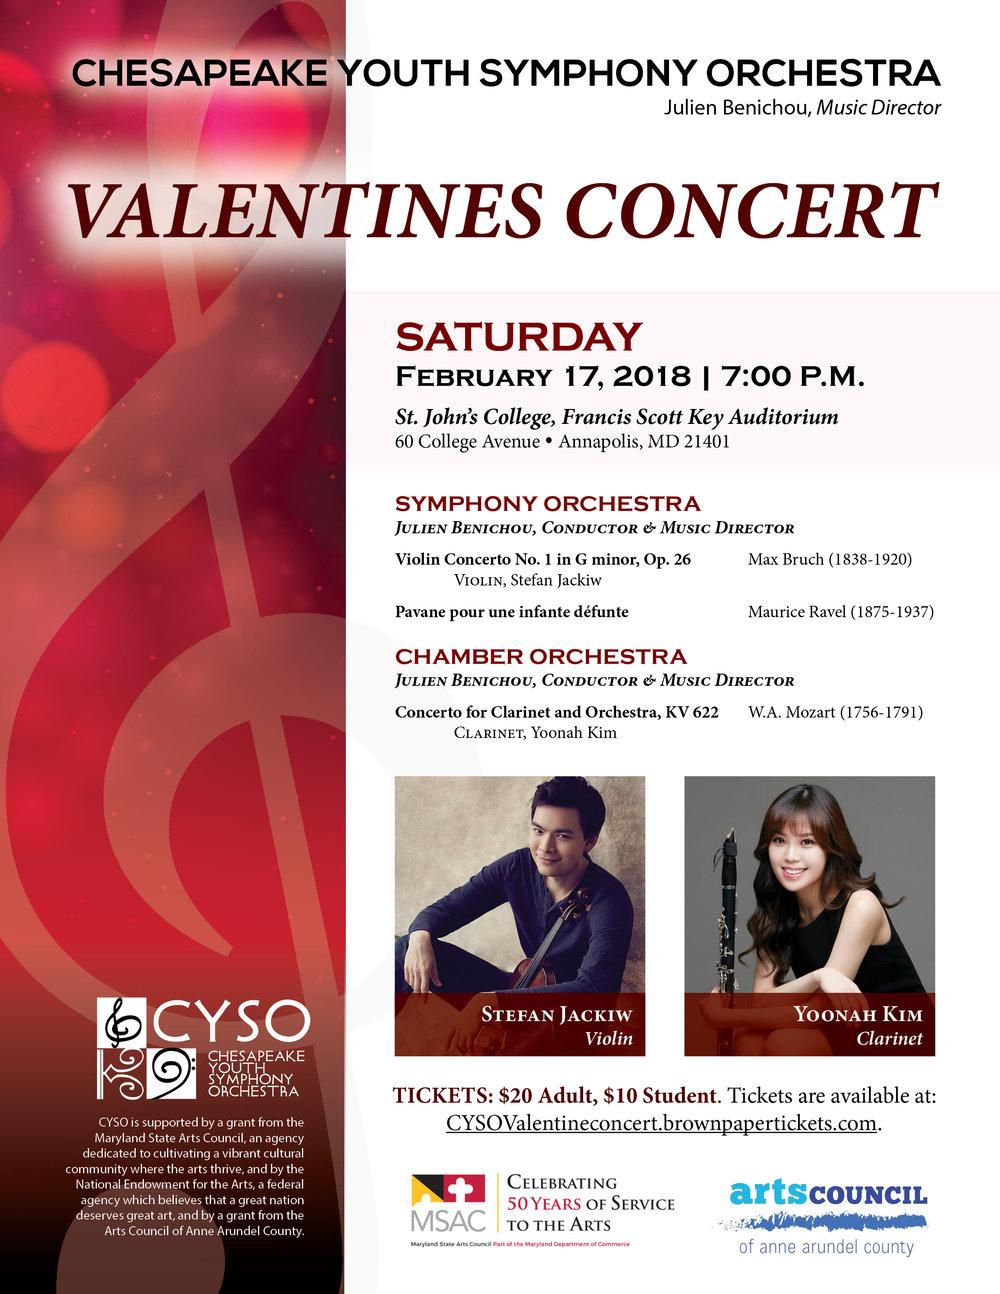 CYSO February Concert Flyer-1.jpg